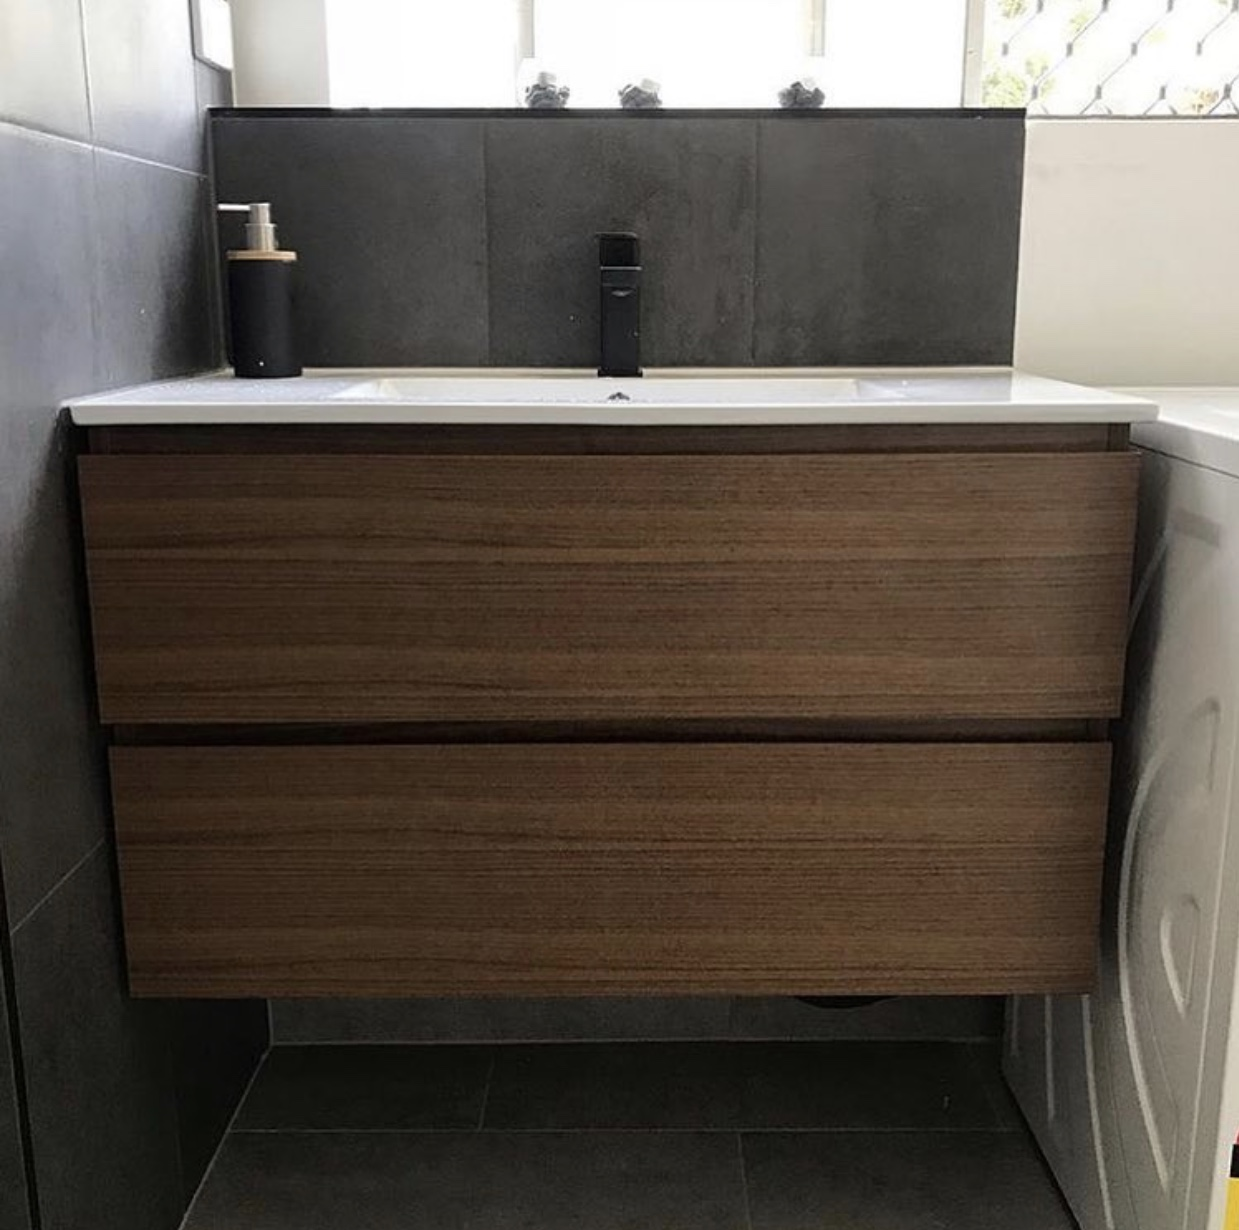 clontarf bathroom renovation